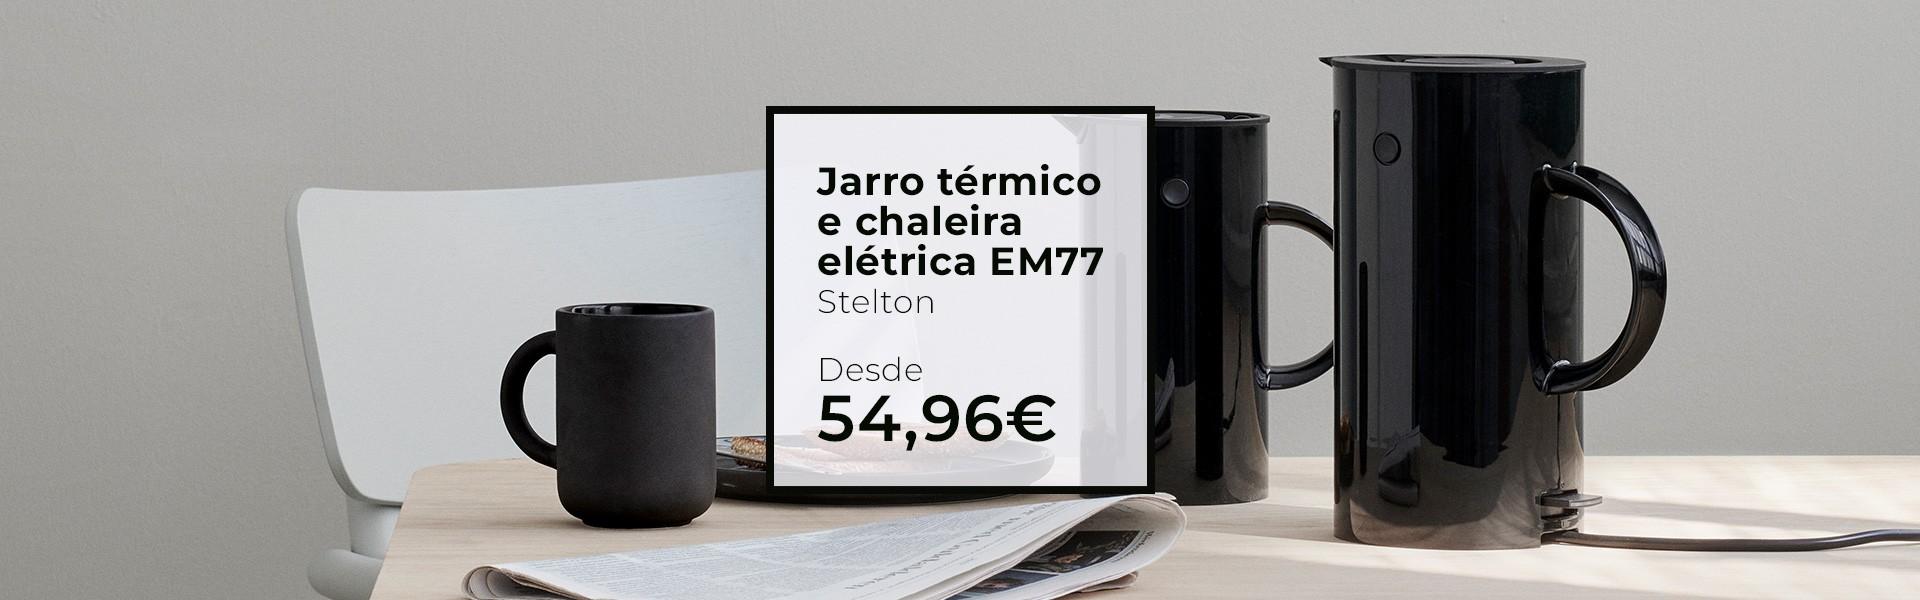 EM77 Stelton